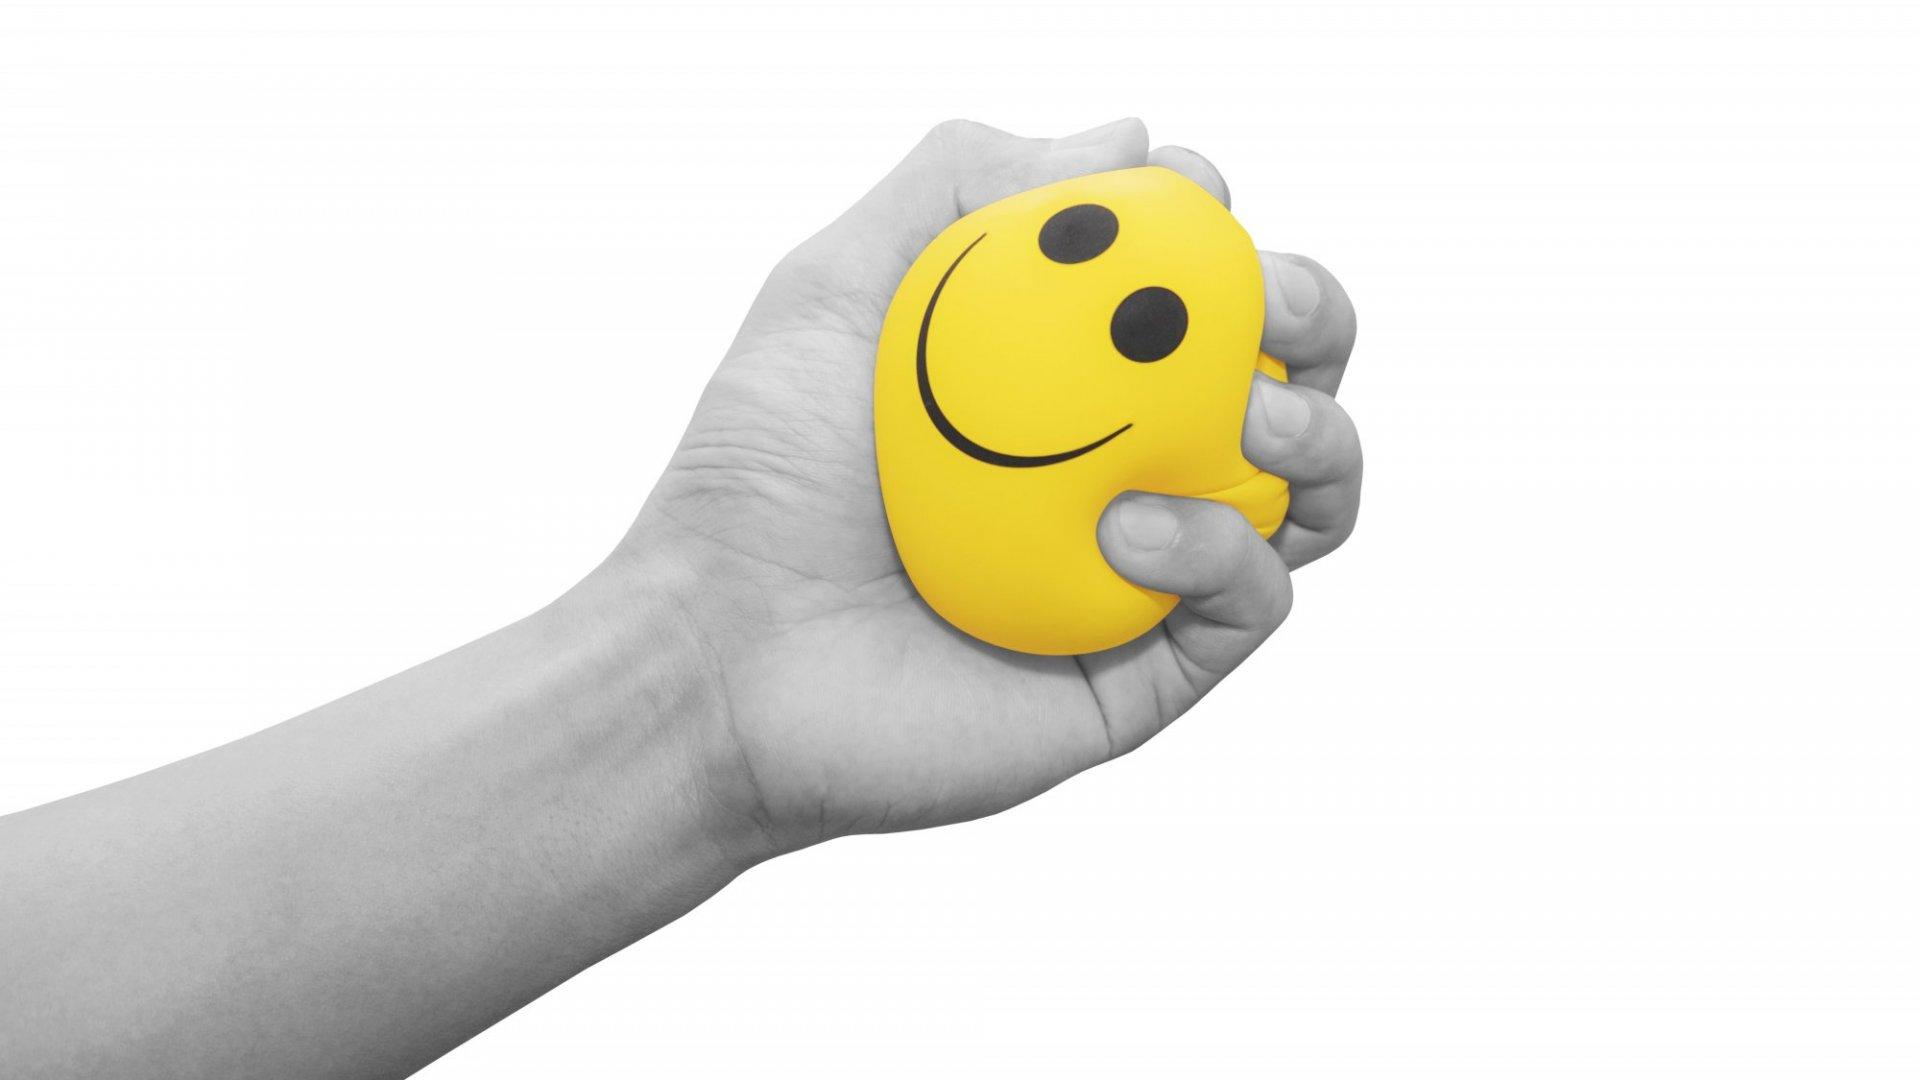 7 Ways to Lower Stress Using Your Emotional Intelligence